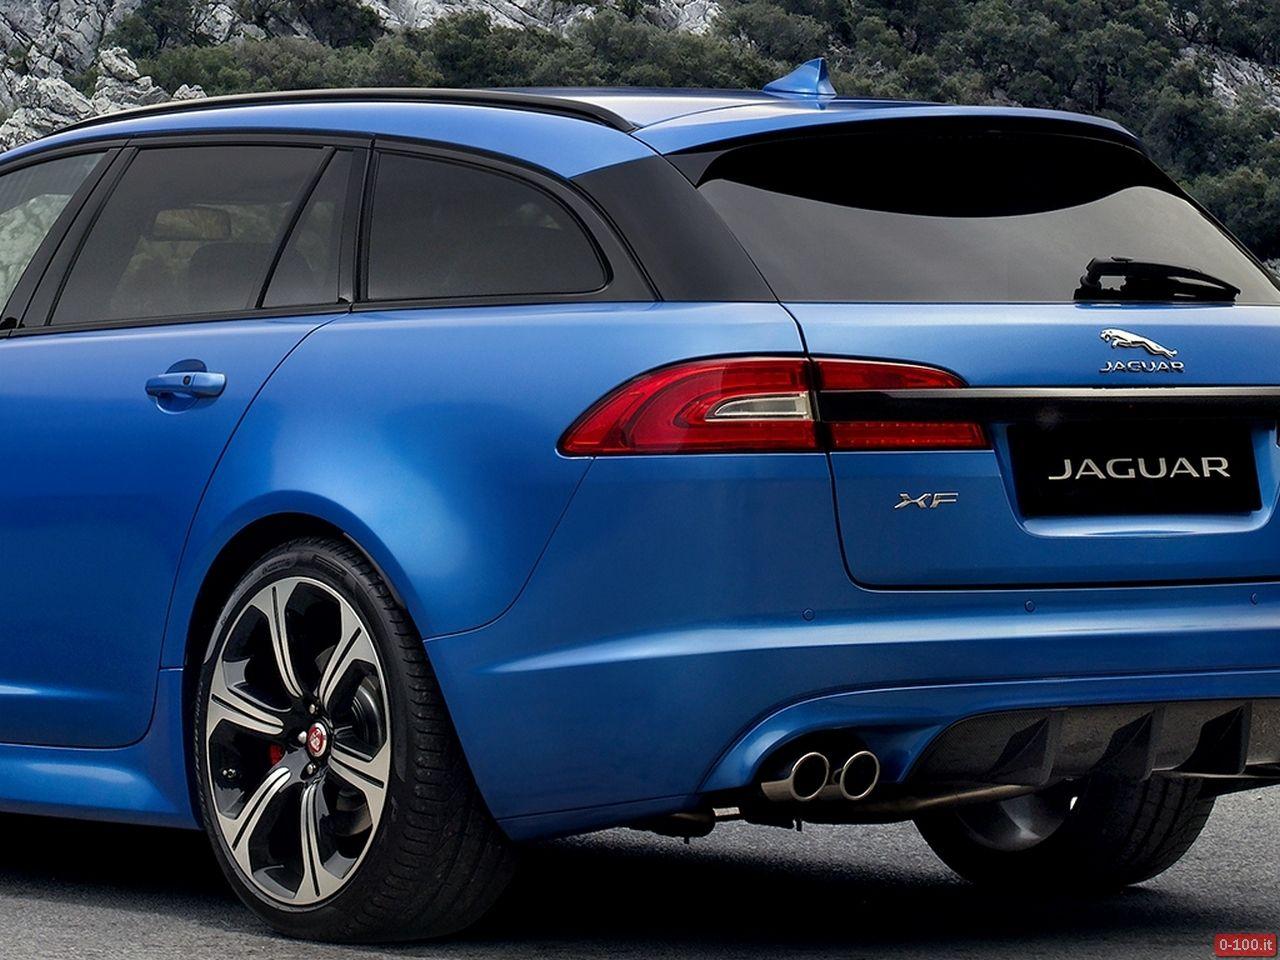 ginevra-2014-jaguar-xf-model-year-2015-xfr-s-sportbrake-0-100_4